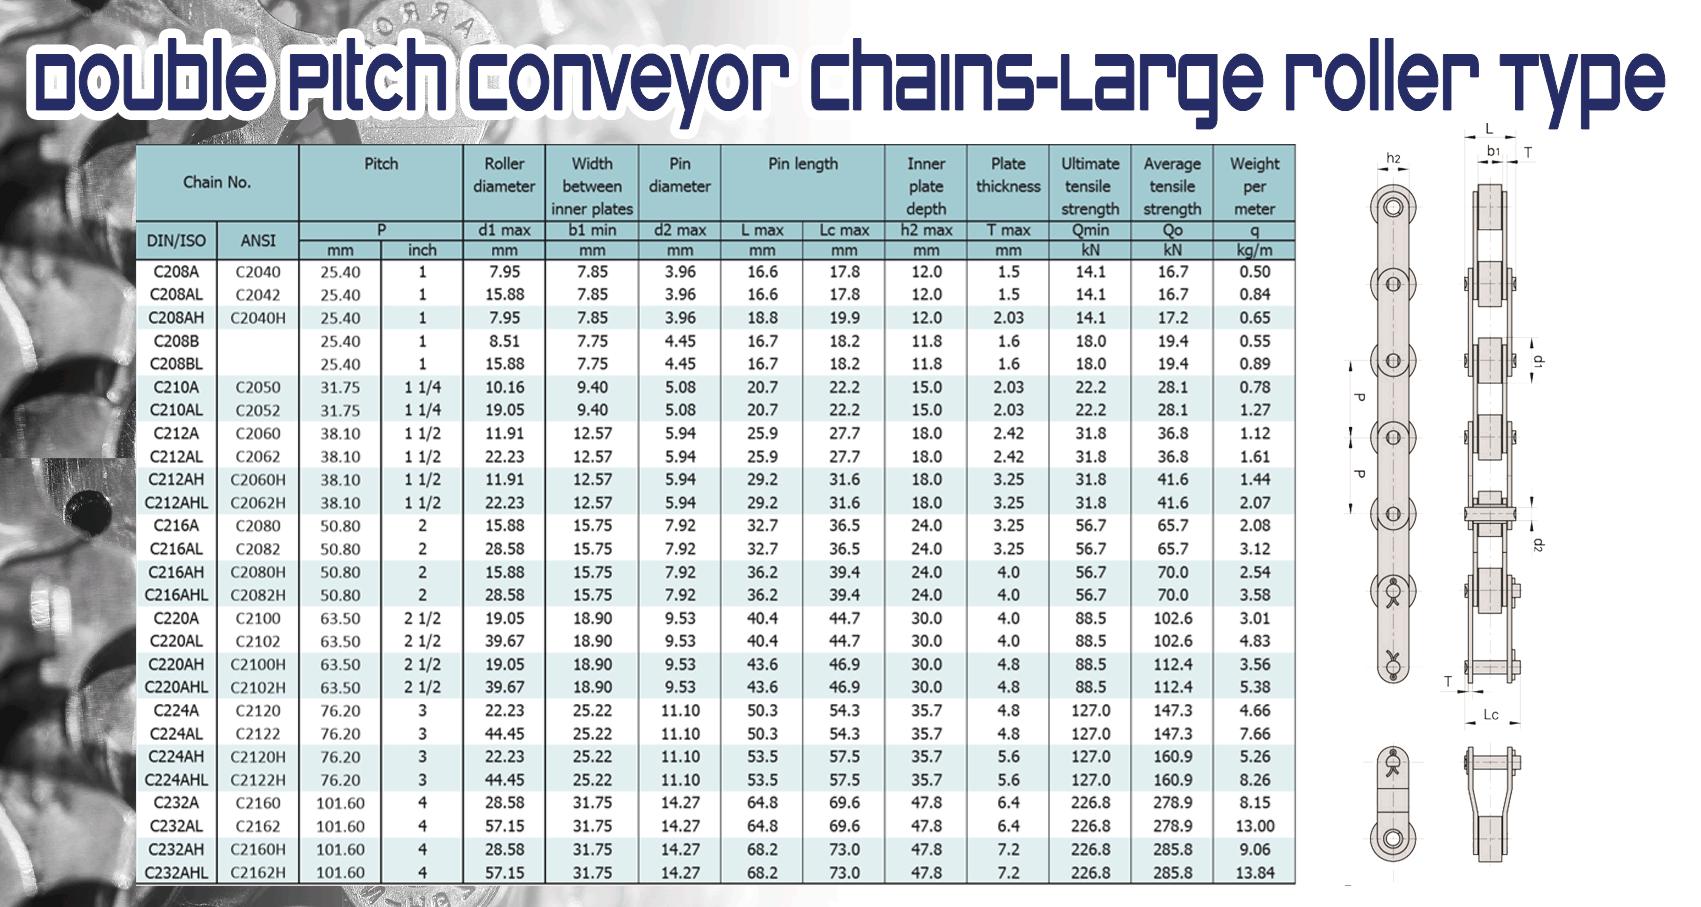 Double Pitch Conveyor Chains-Large roller Type( โซ่ลำเลียงพิชคู่ แบบโรเลอร์ใหญ่)